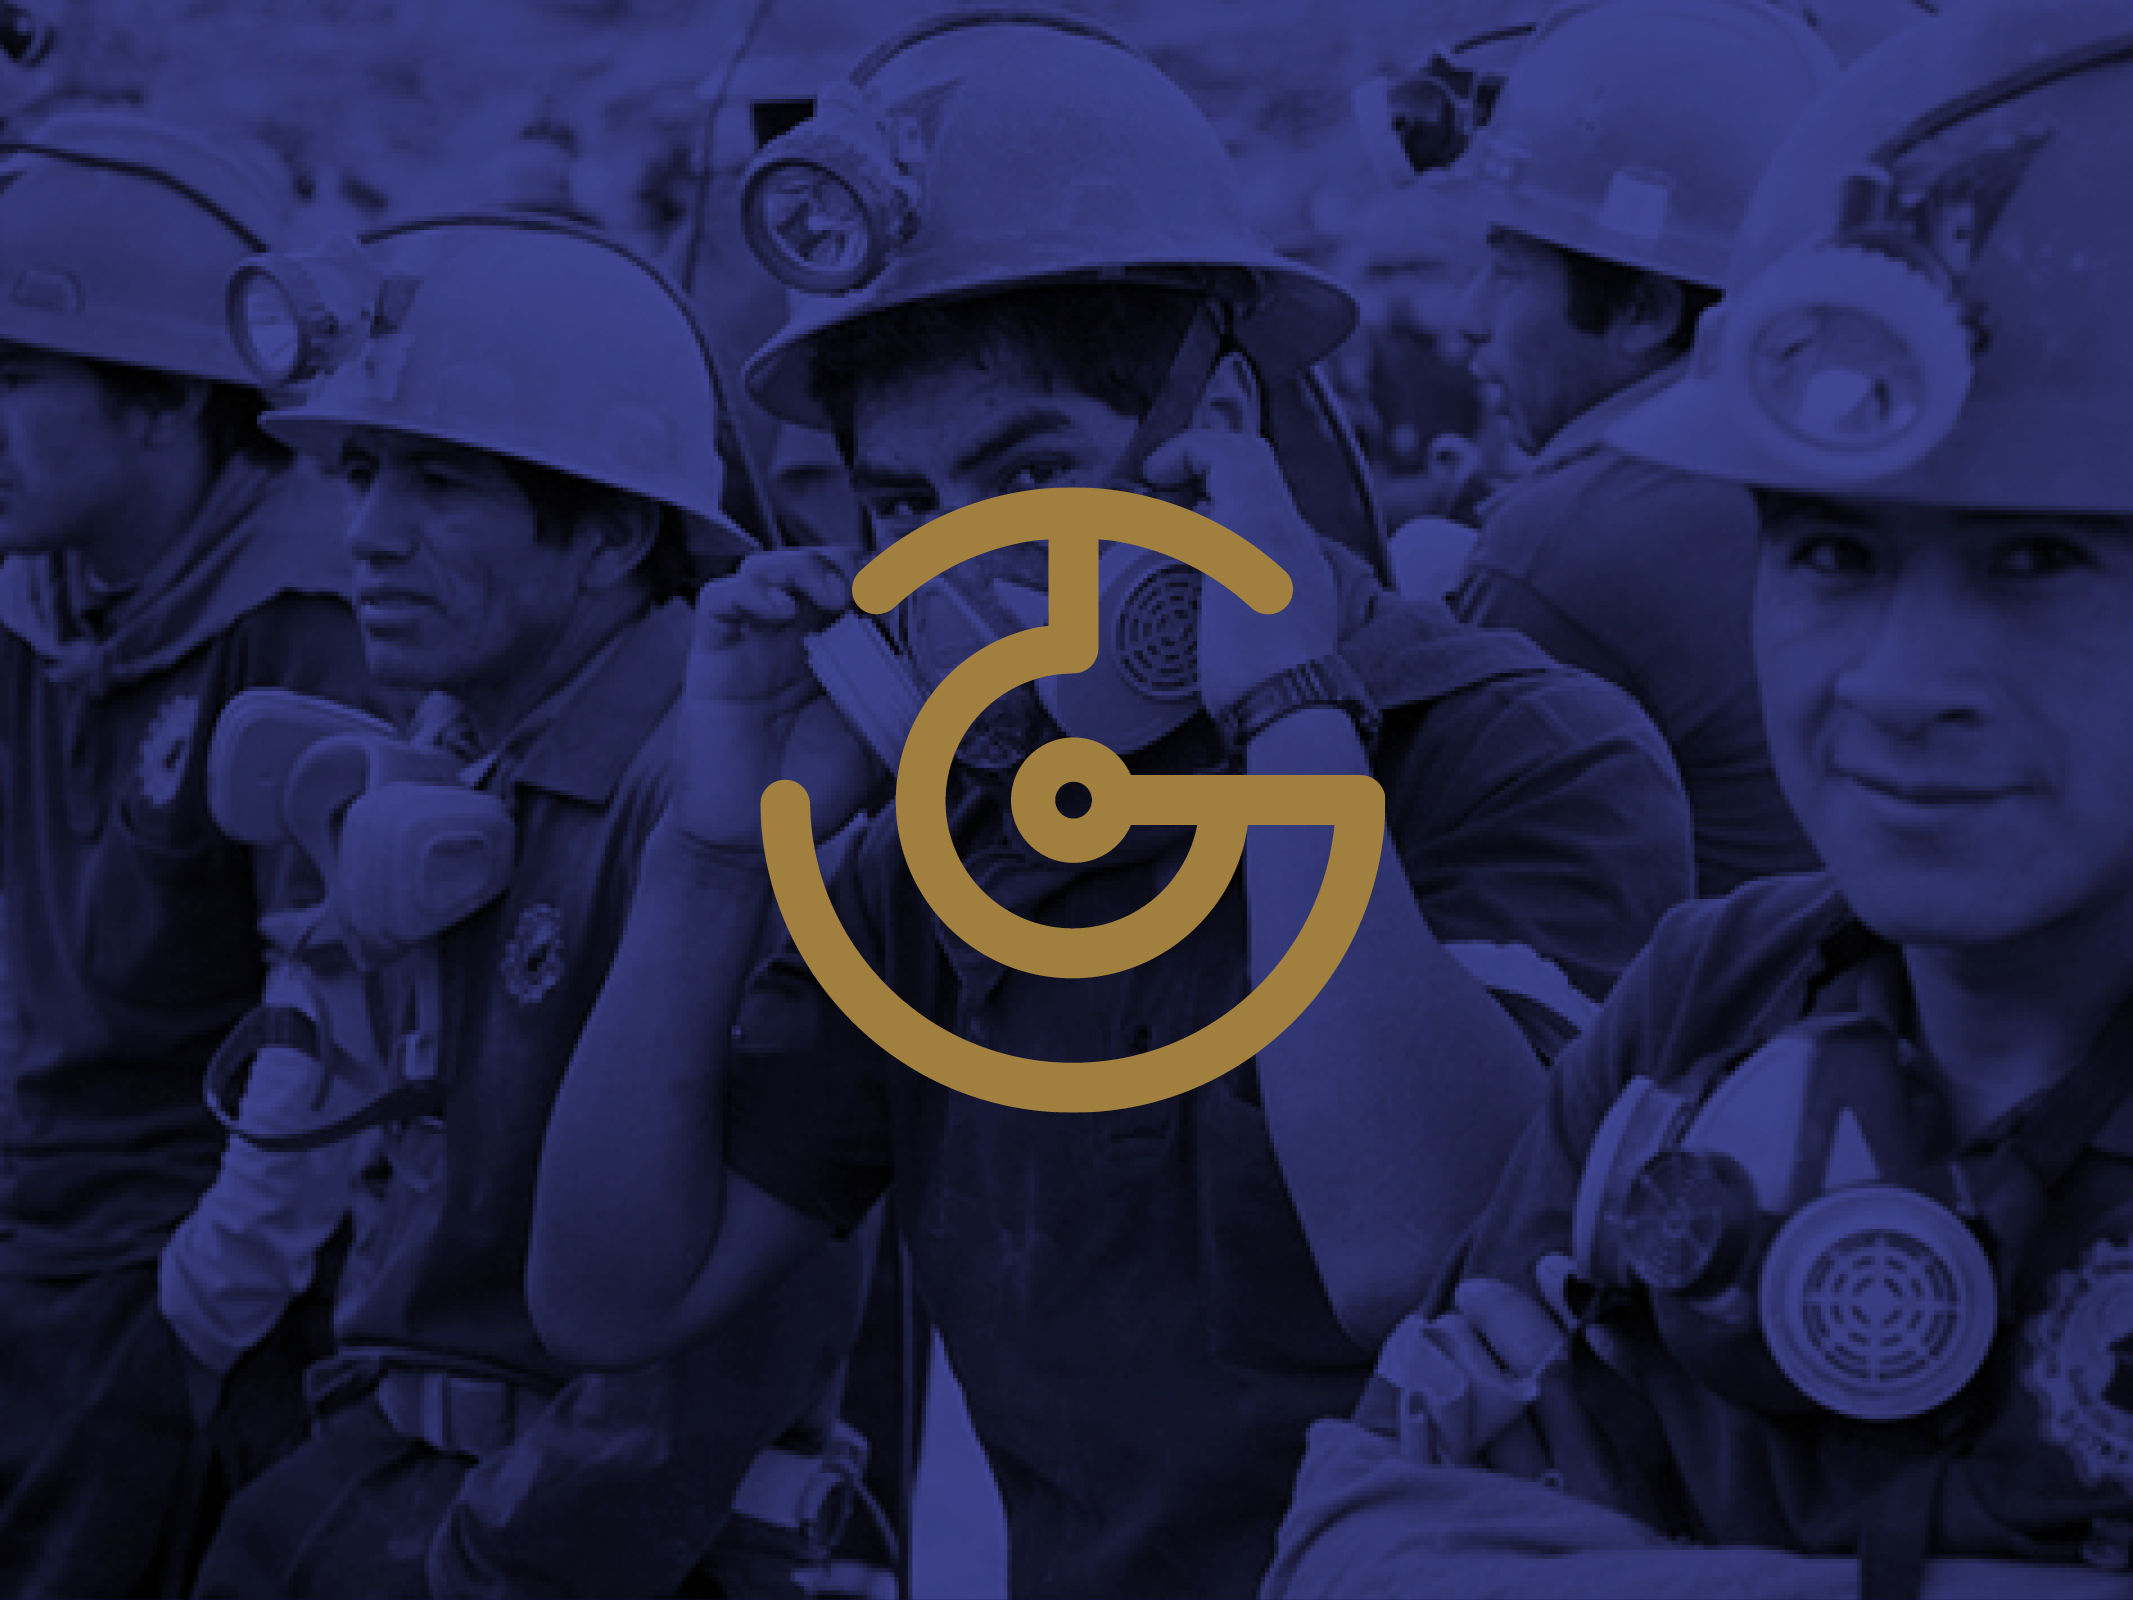 CORPORATE DESIGN  TRAID GOLD /Fairtrade Gold